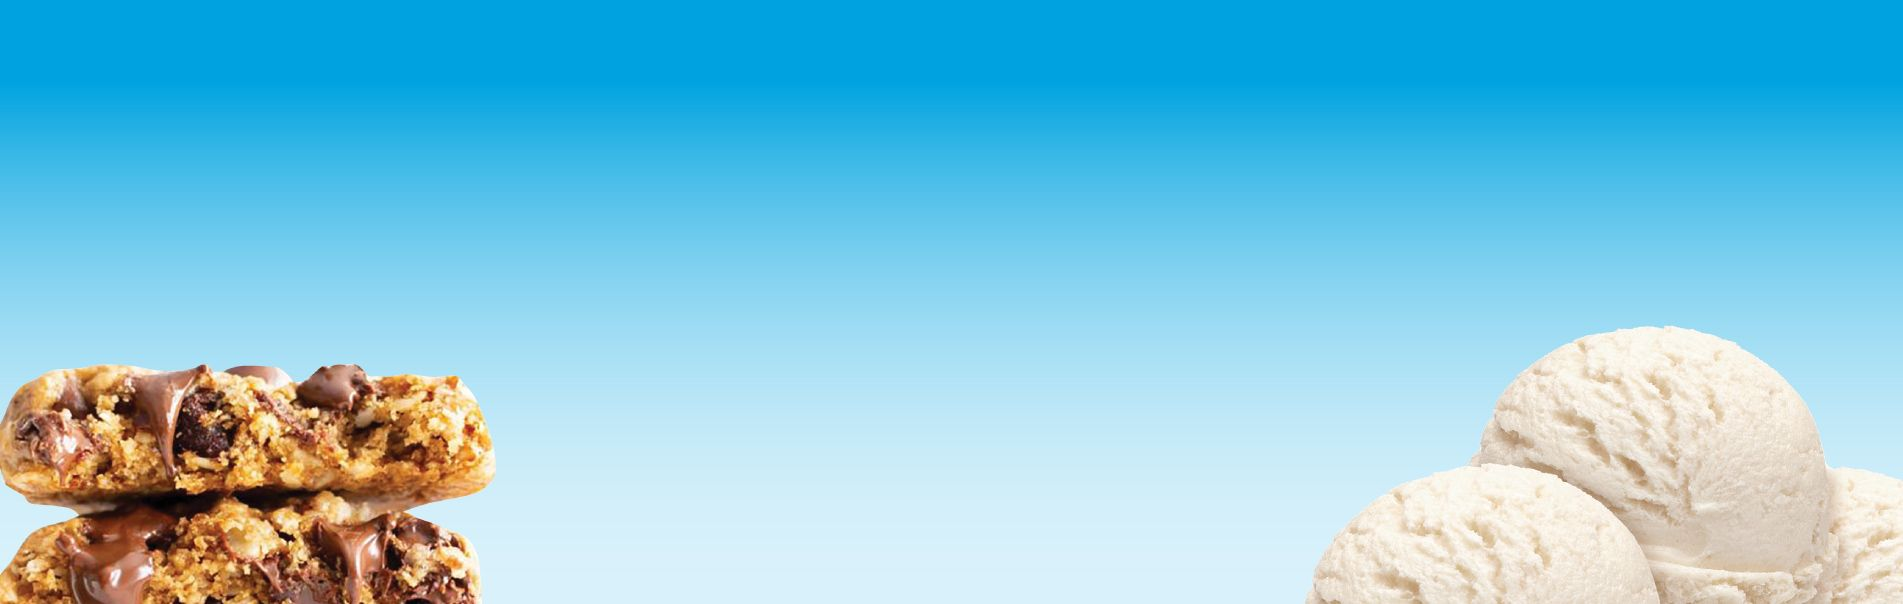 adform_2020_referral_cookies_banner2